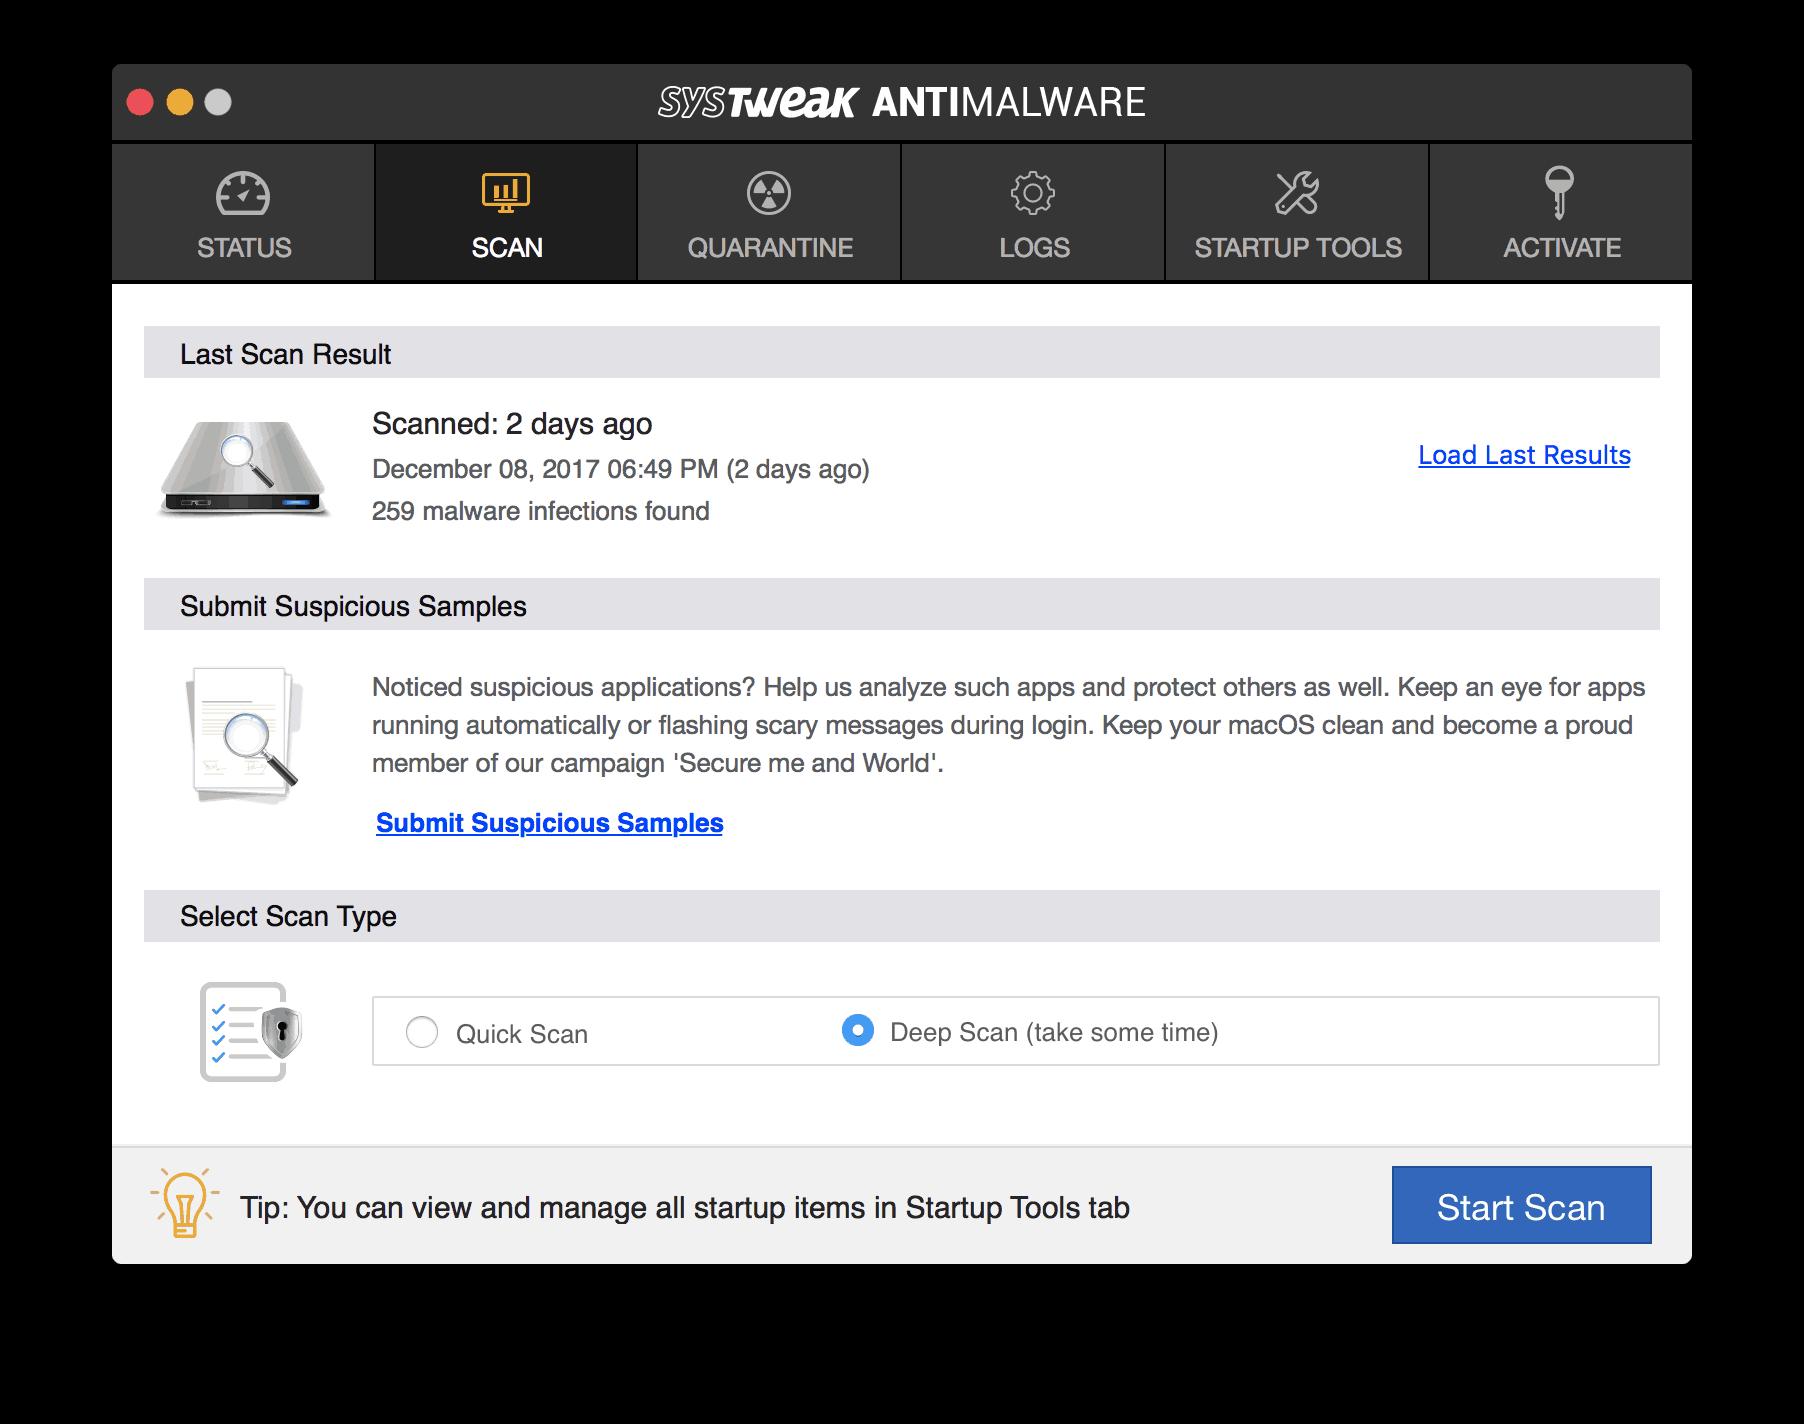 systweak antimalware for mac in darth miner